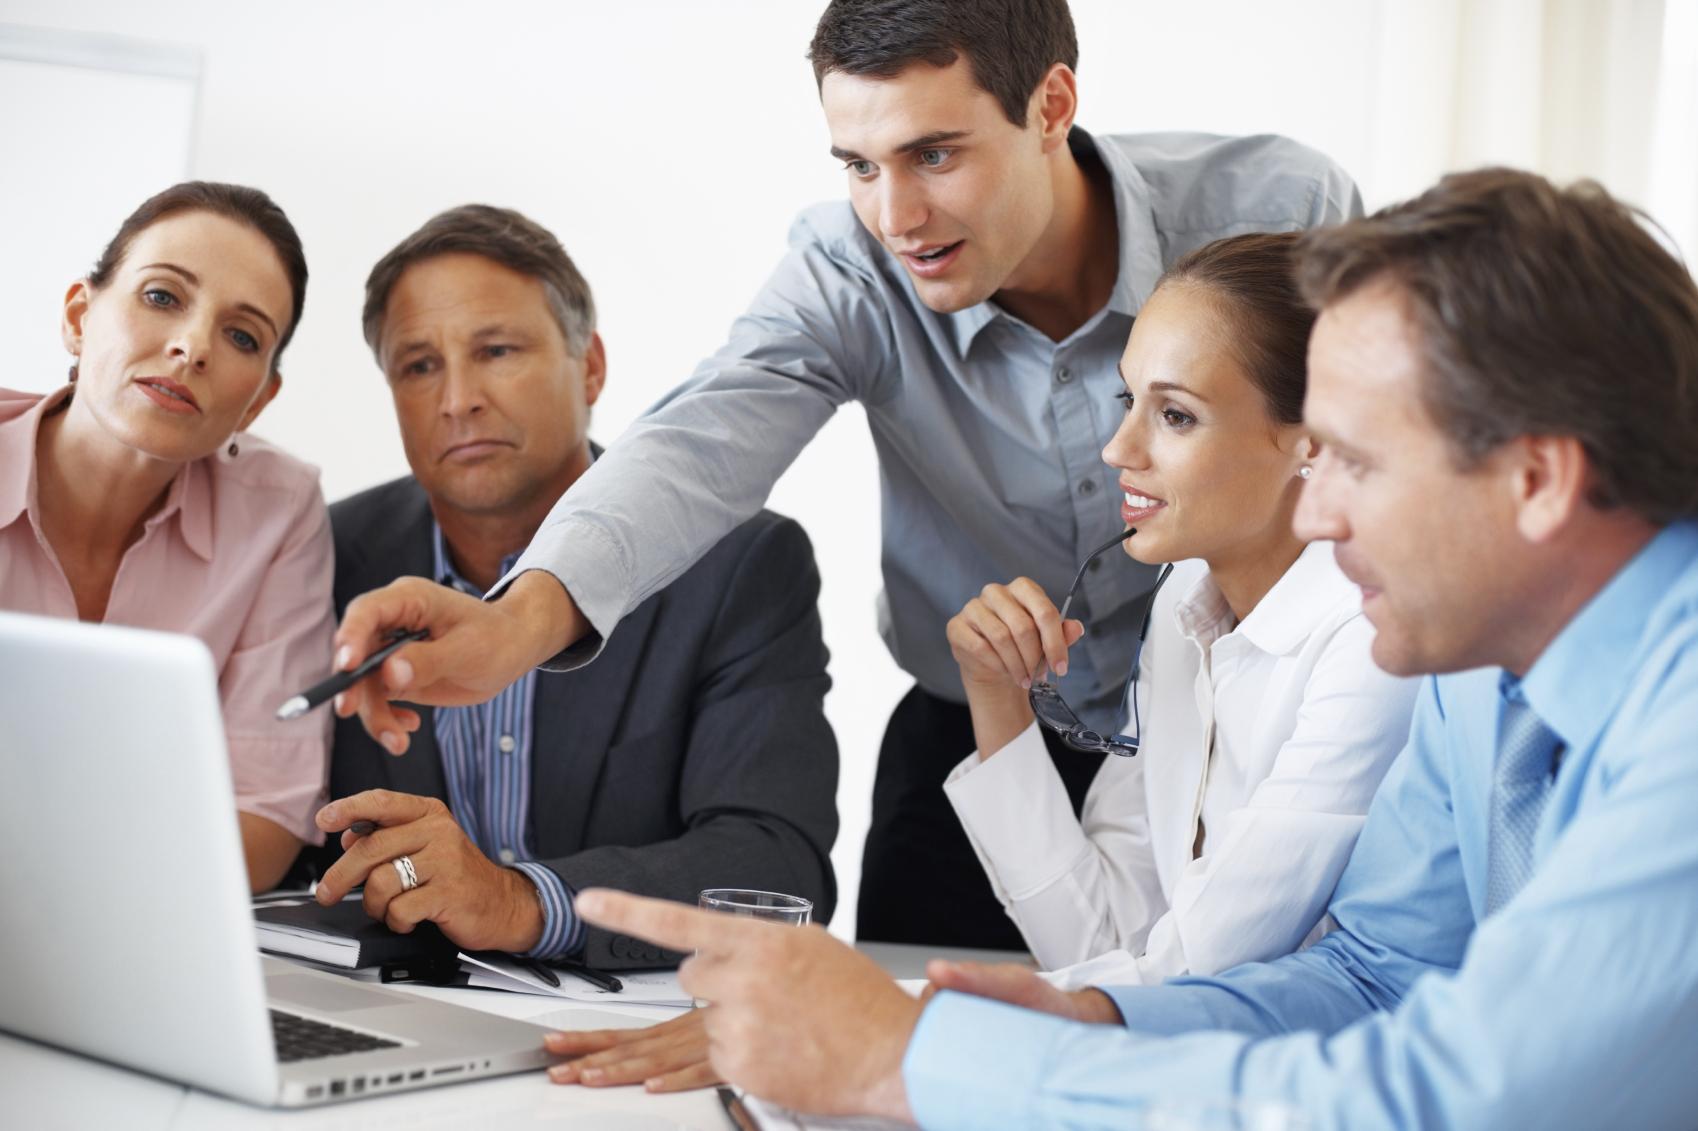 curso de seo online - consultor